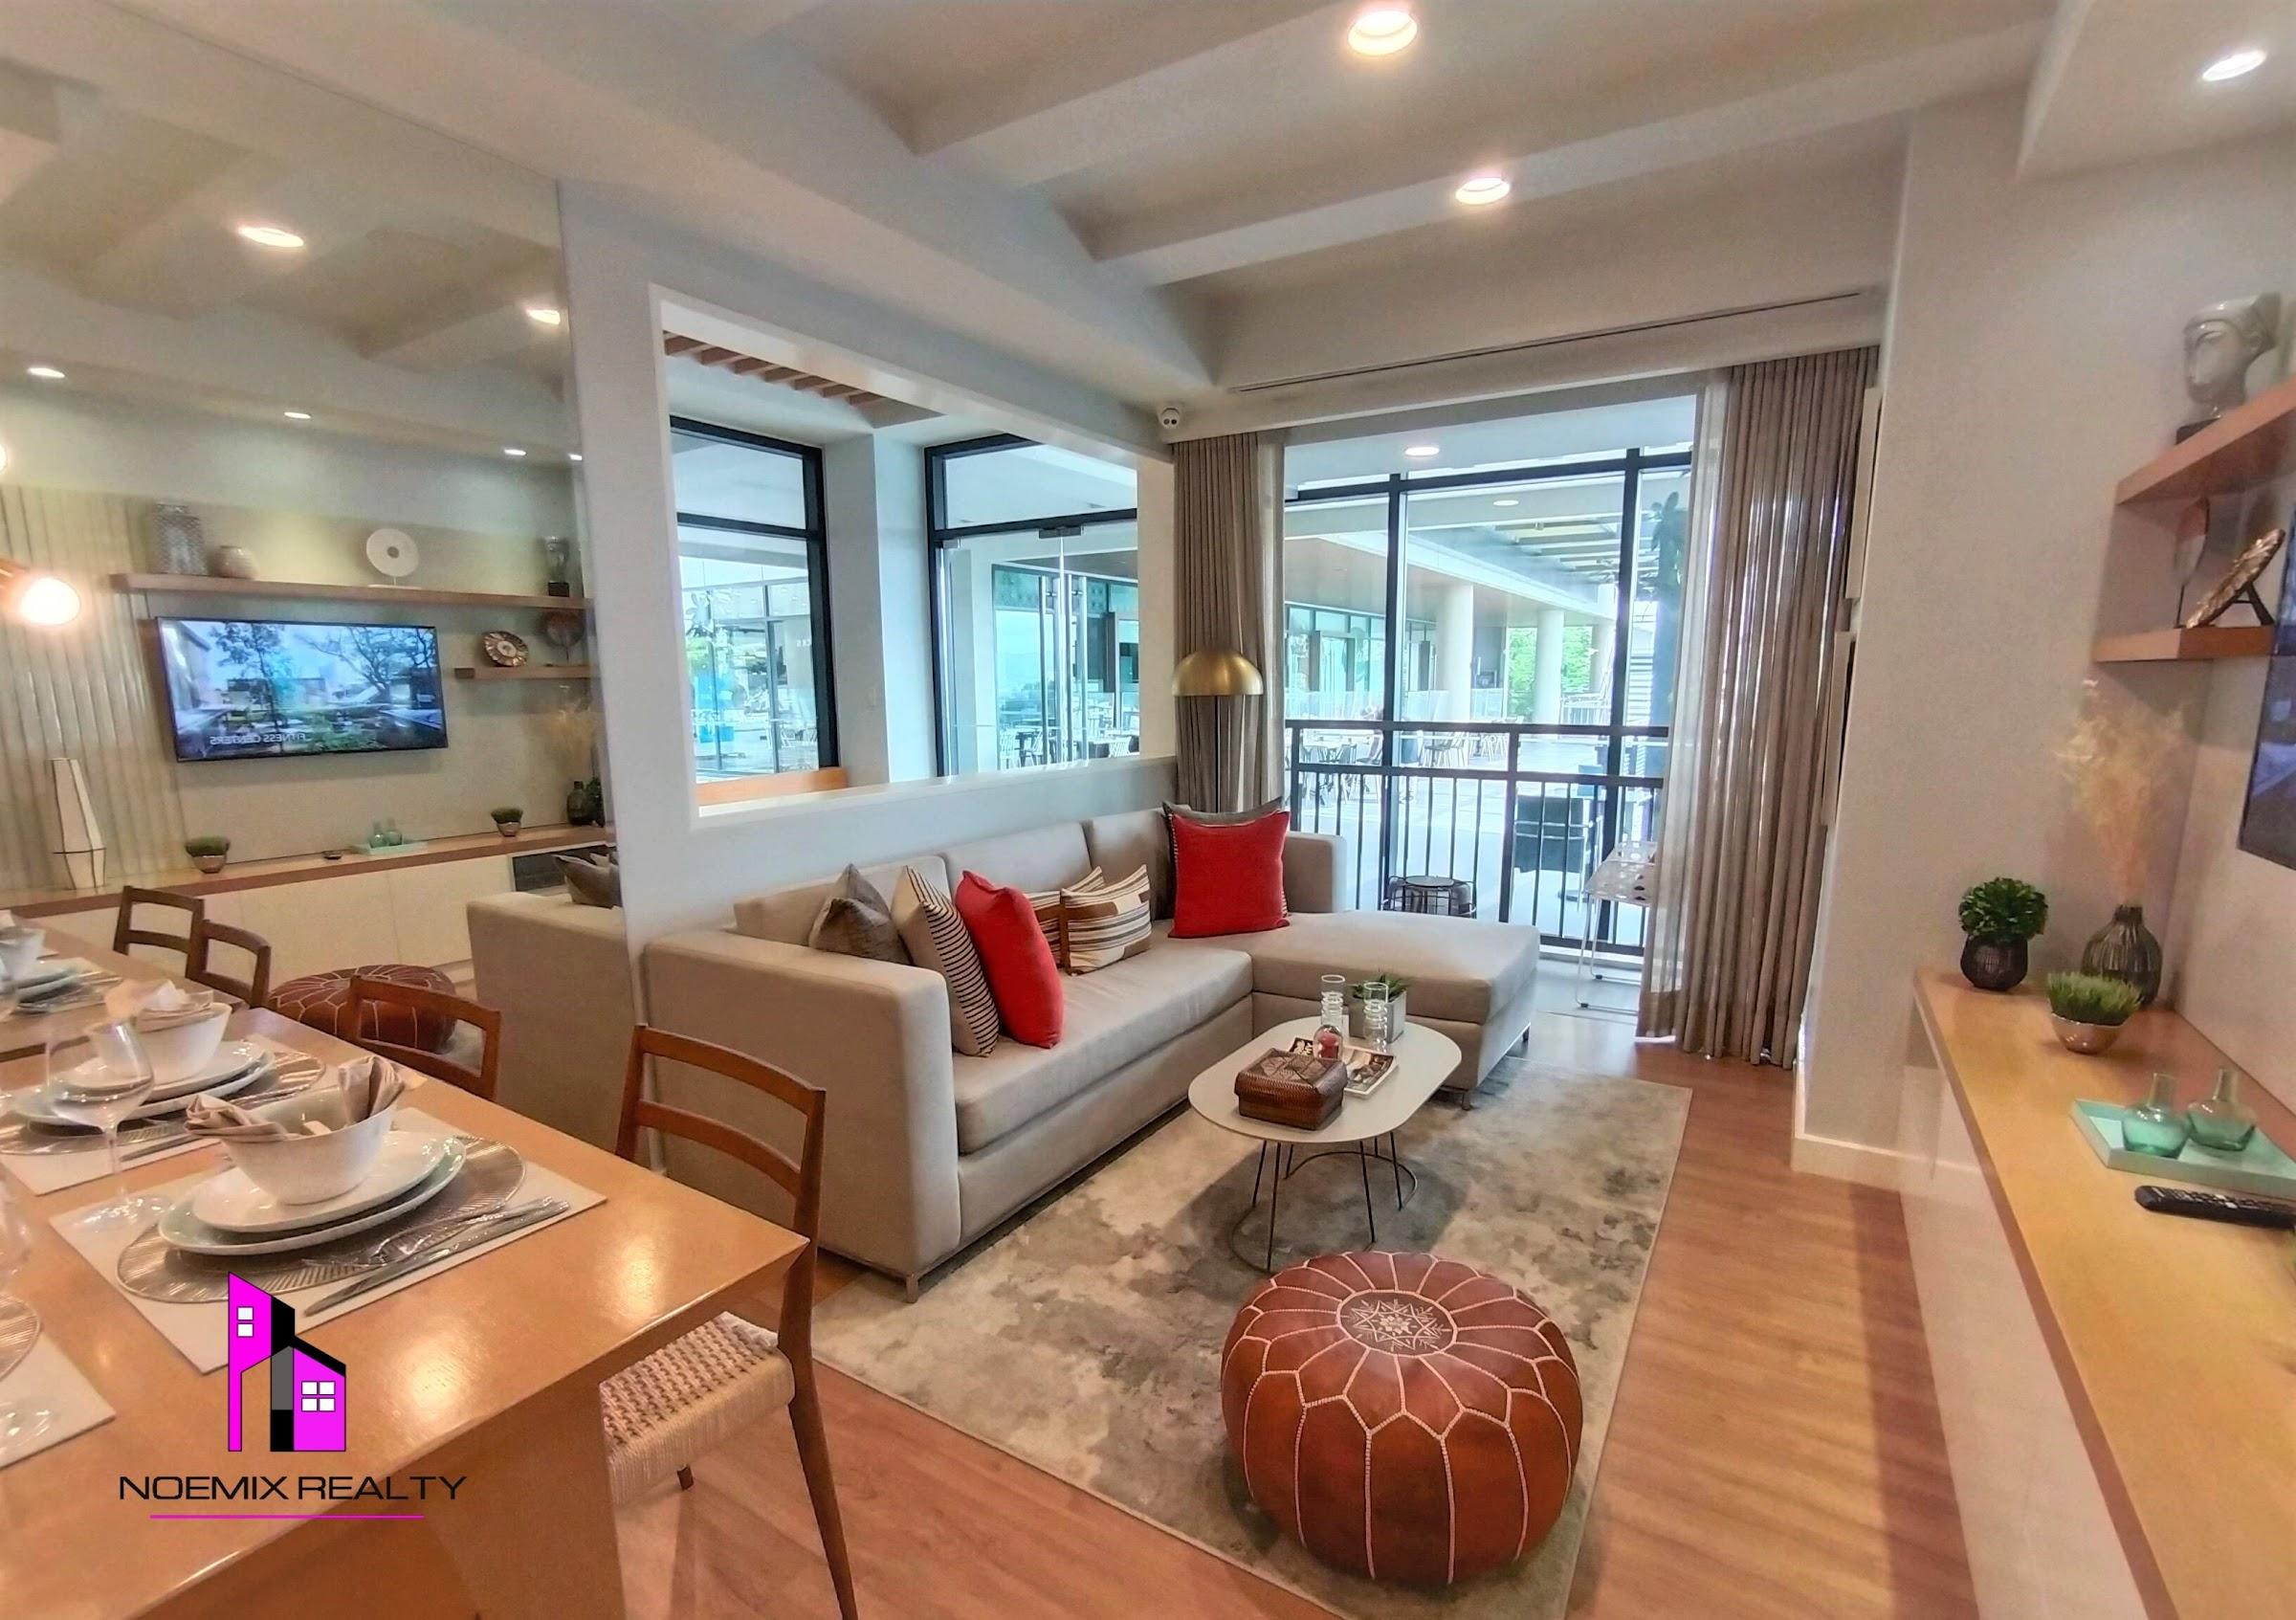 The Arton by Rockwell, Katipunan, Quezon City 2 bedroom unit